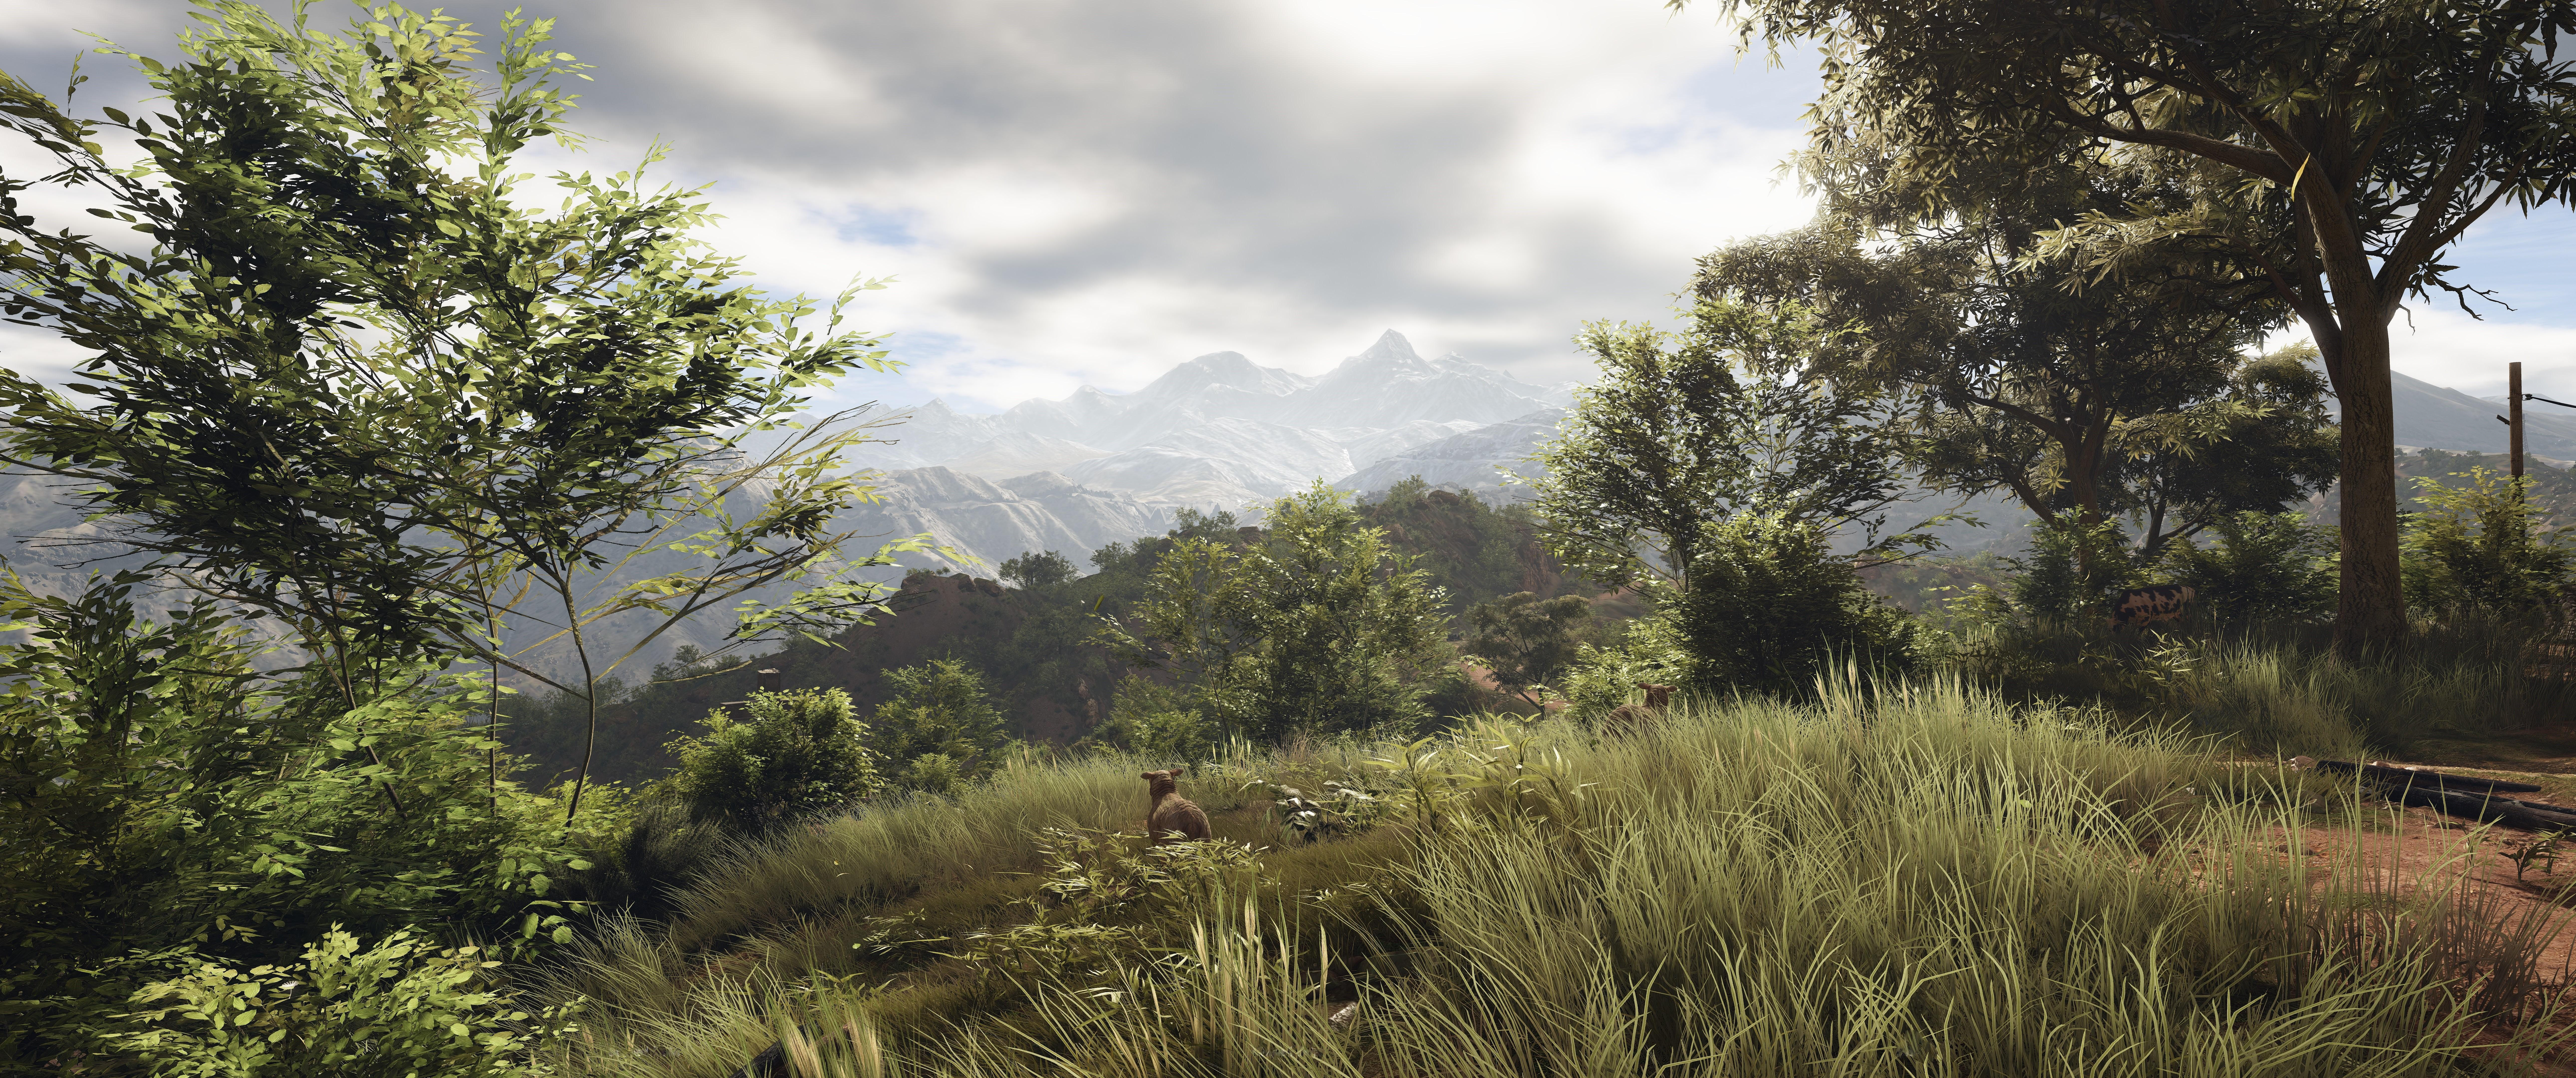 Wallpaper Ghostreconwildlands Ghostrecon Ubisoft Videogame